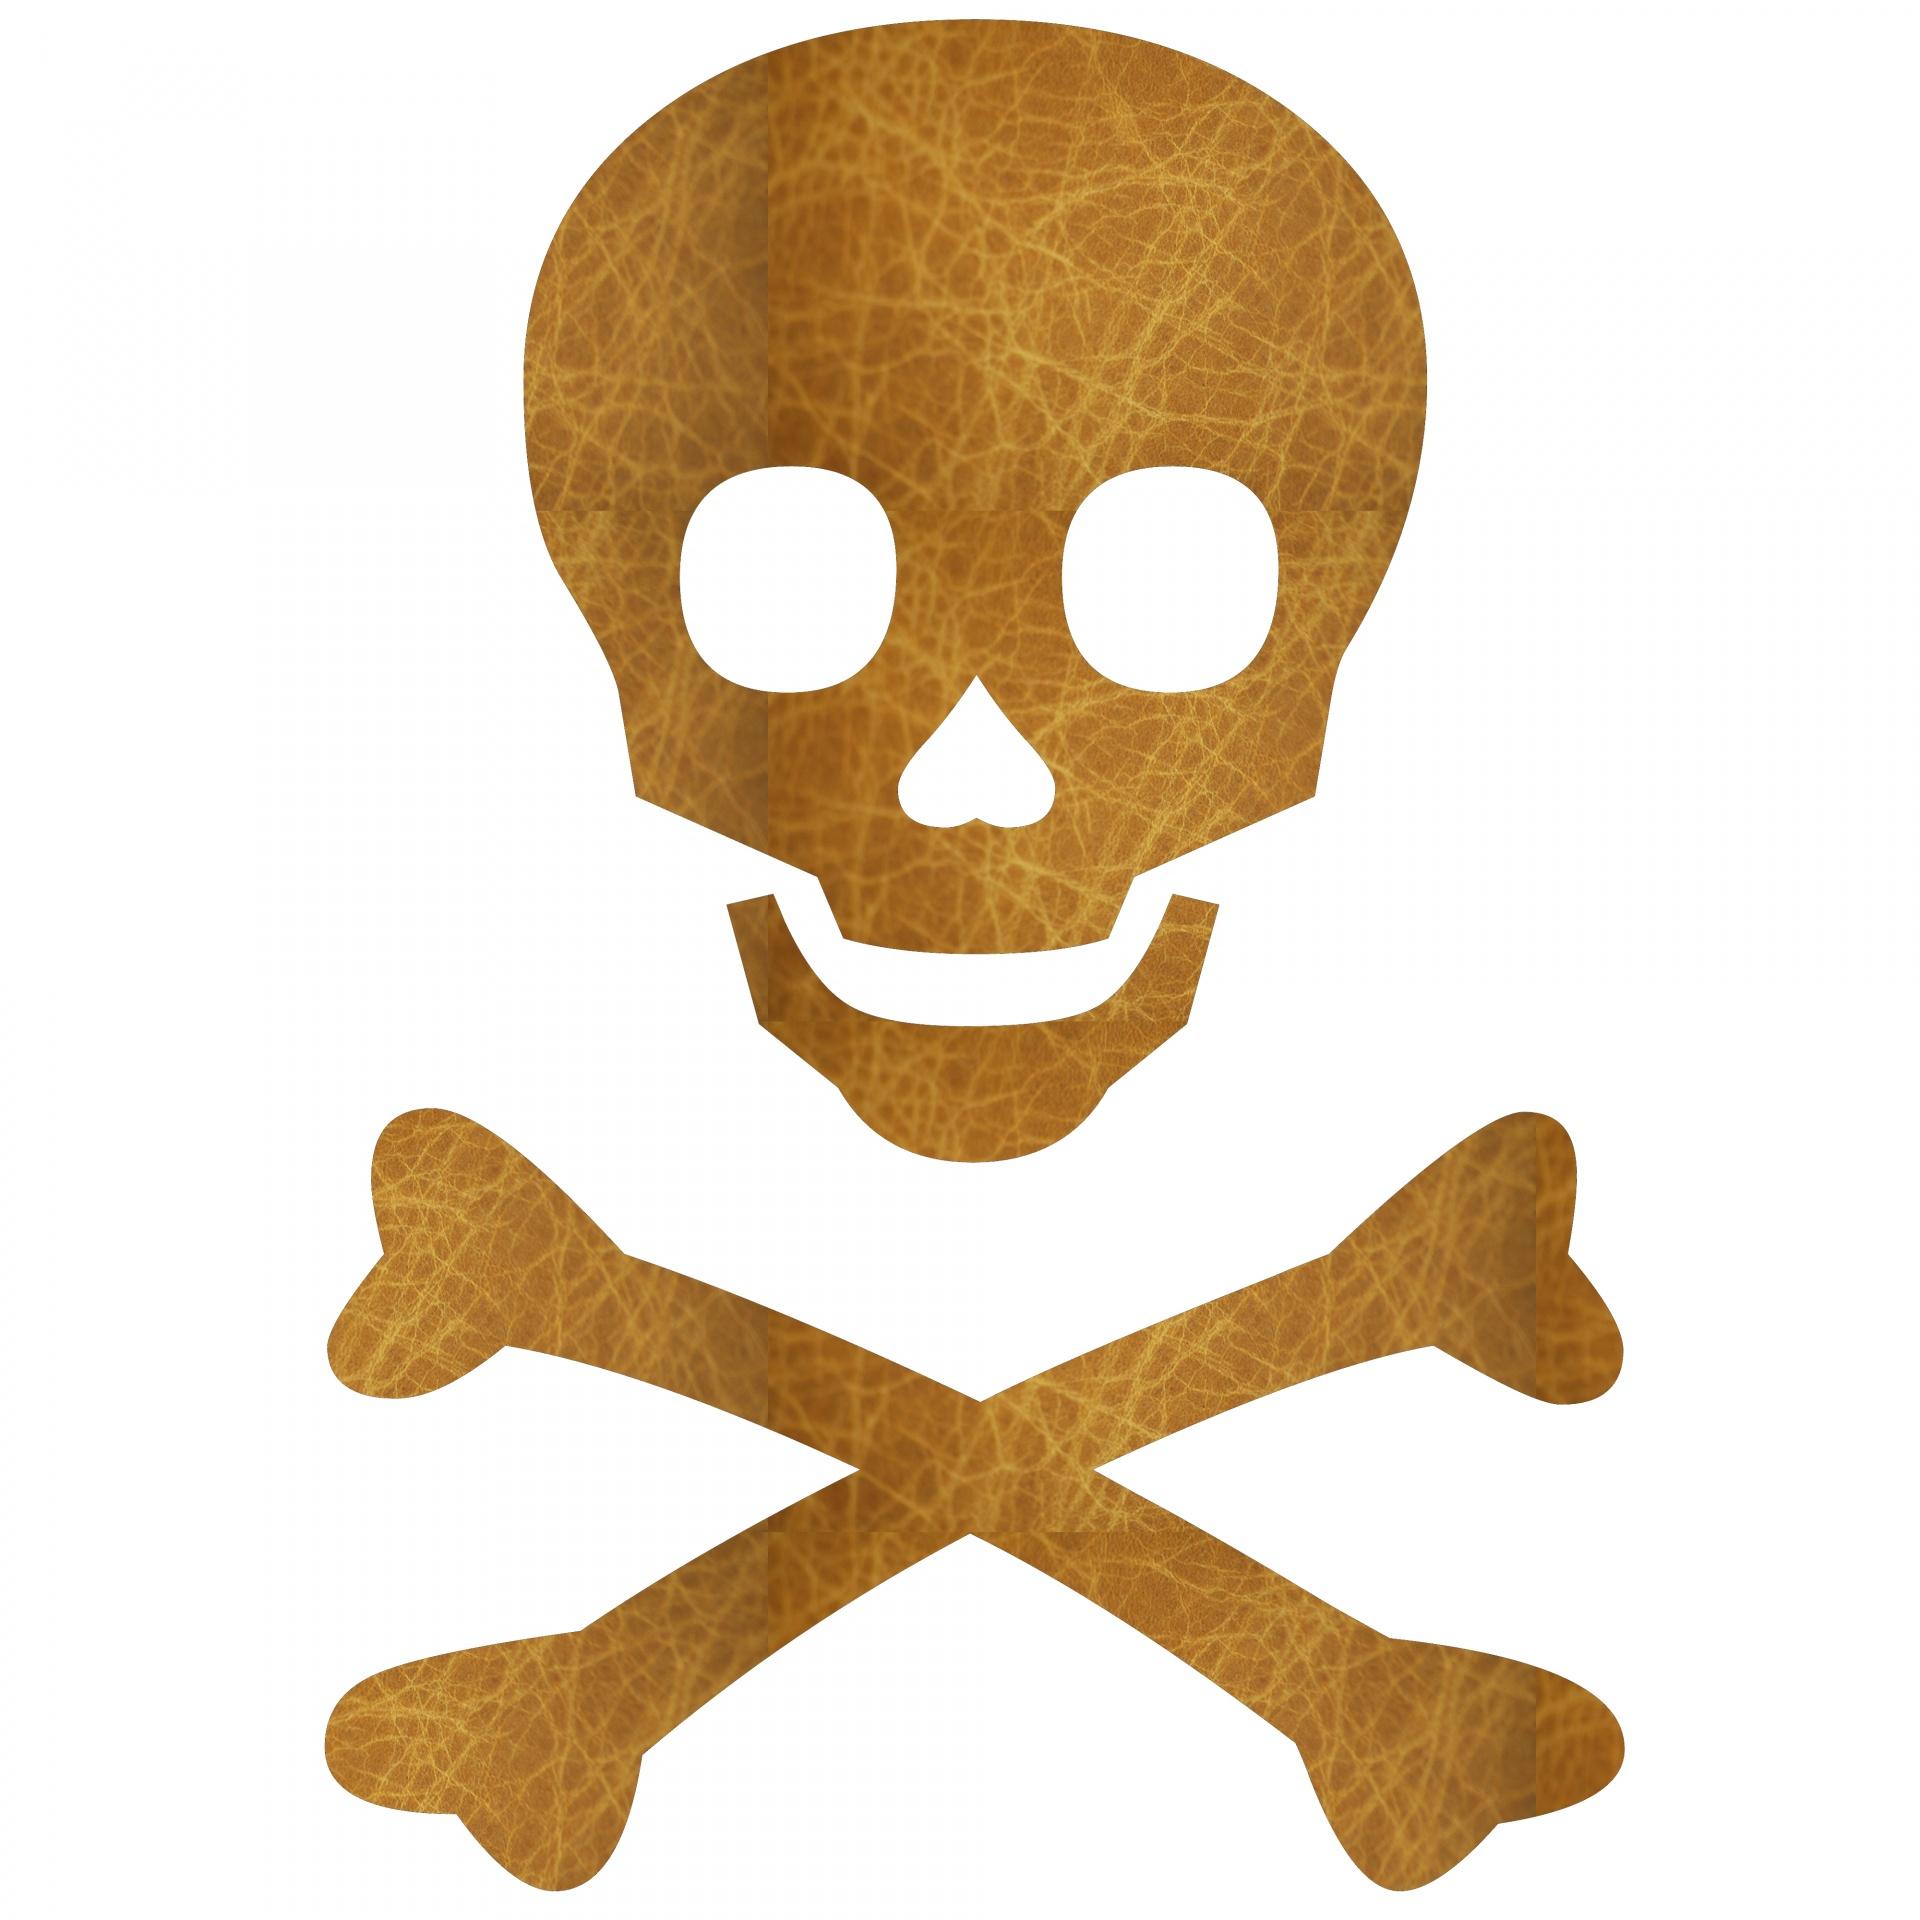 1920x1920 Skull And Bones